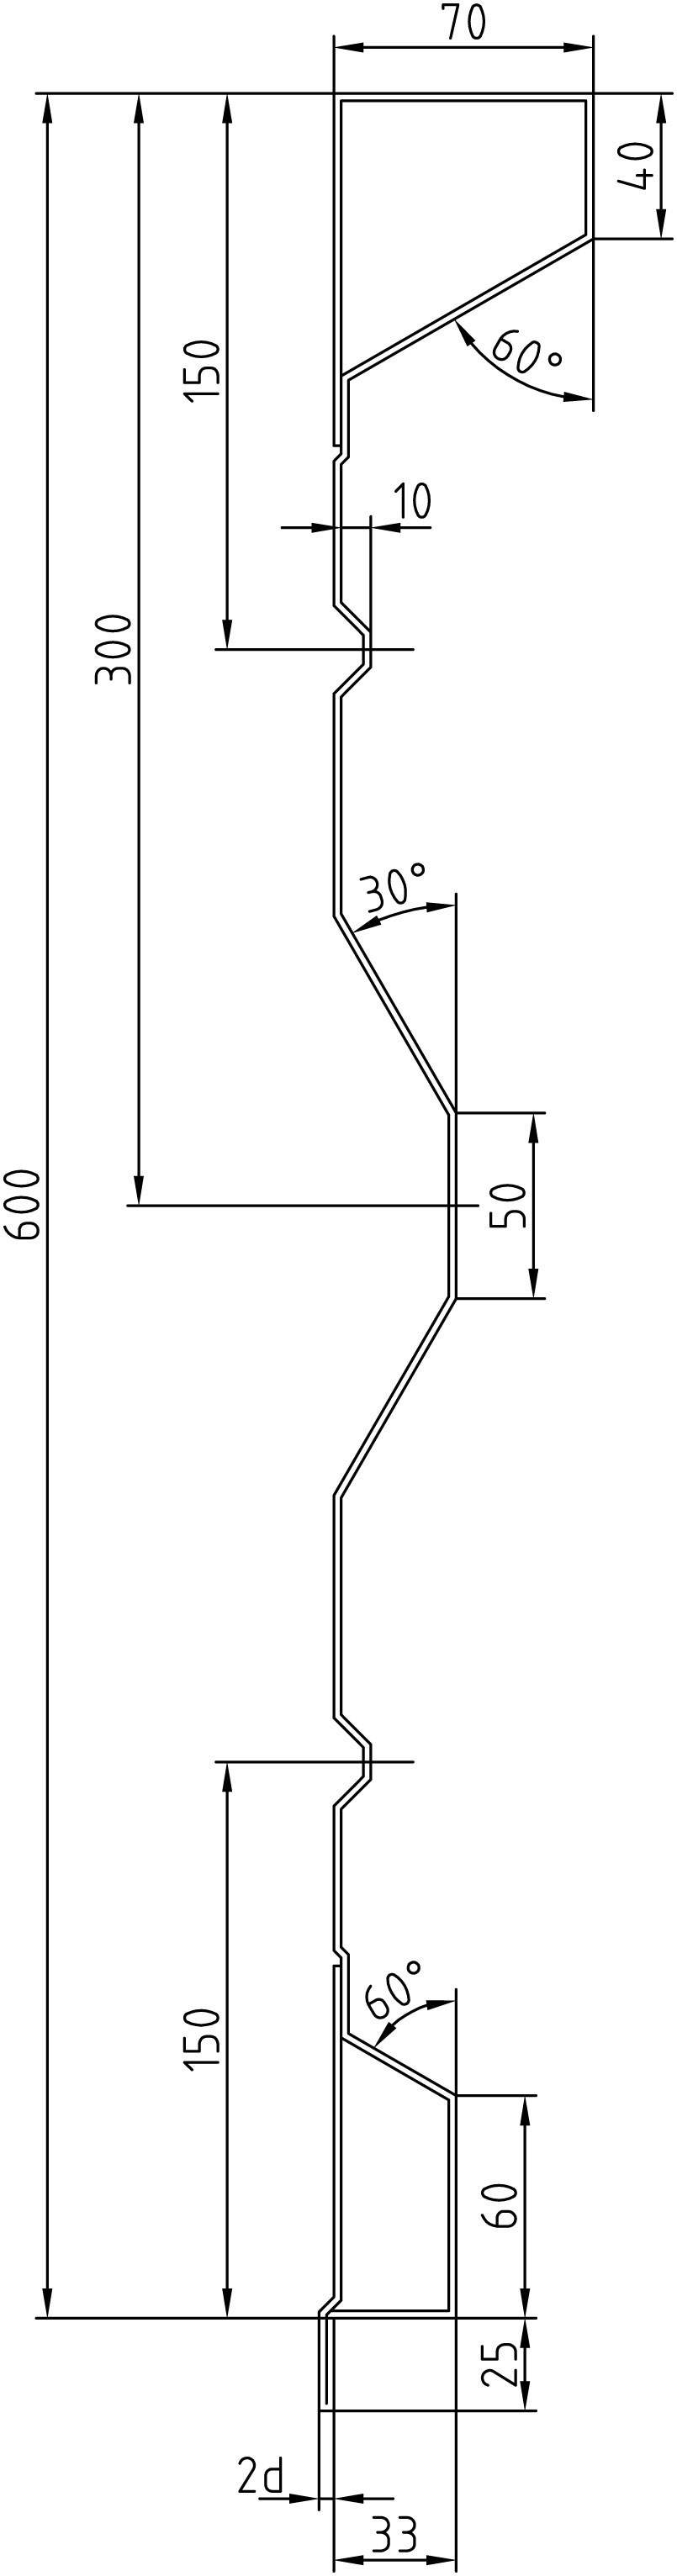 Brantner Kipper und Anhänger - 600x2x4469 AWS samt EL o. BW- Verb. o. PW- Bolzen